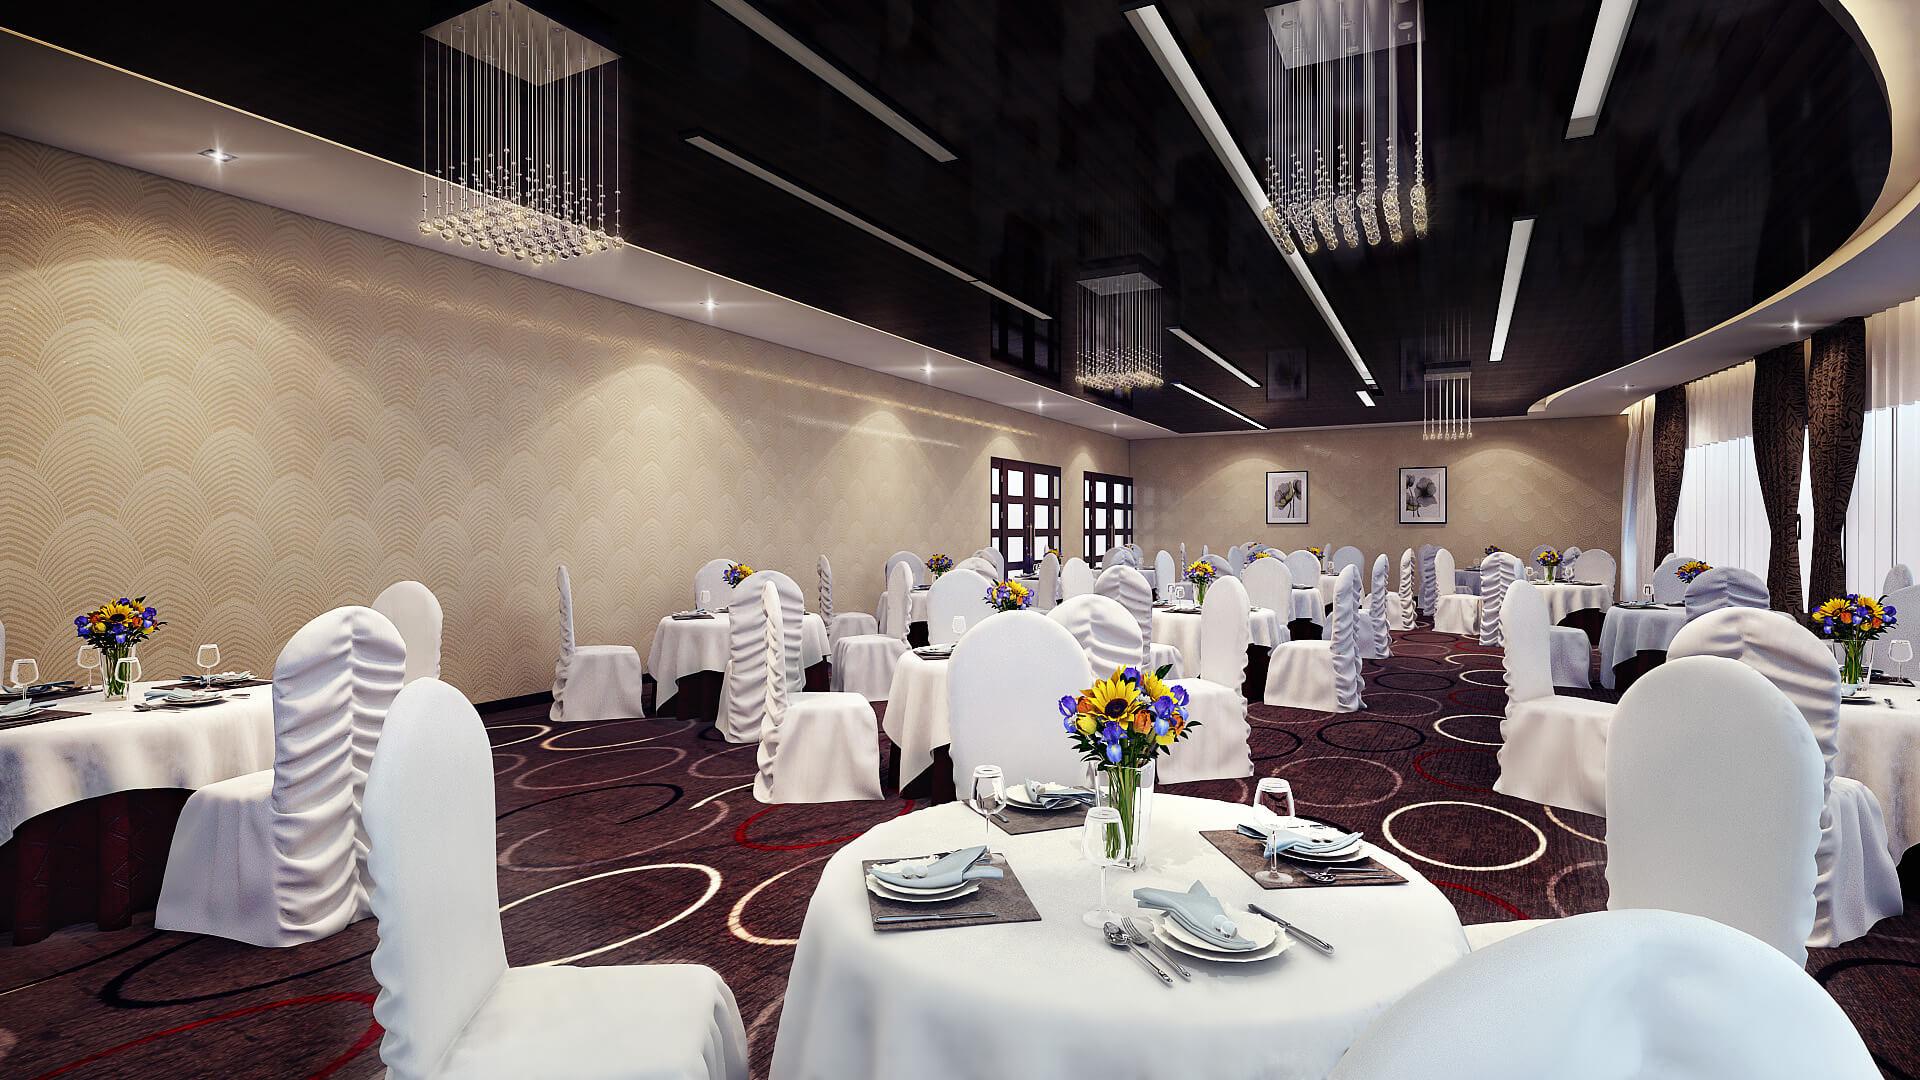 Banquet hall reception area download 3d house - 3d Banquet Hall Interior Design